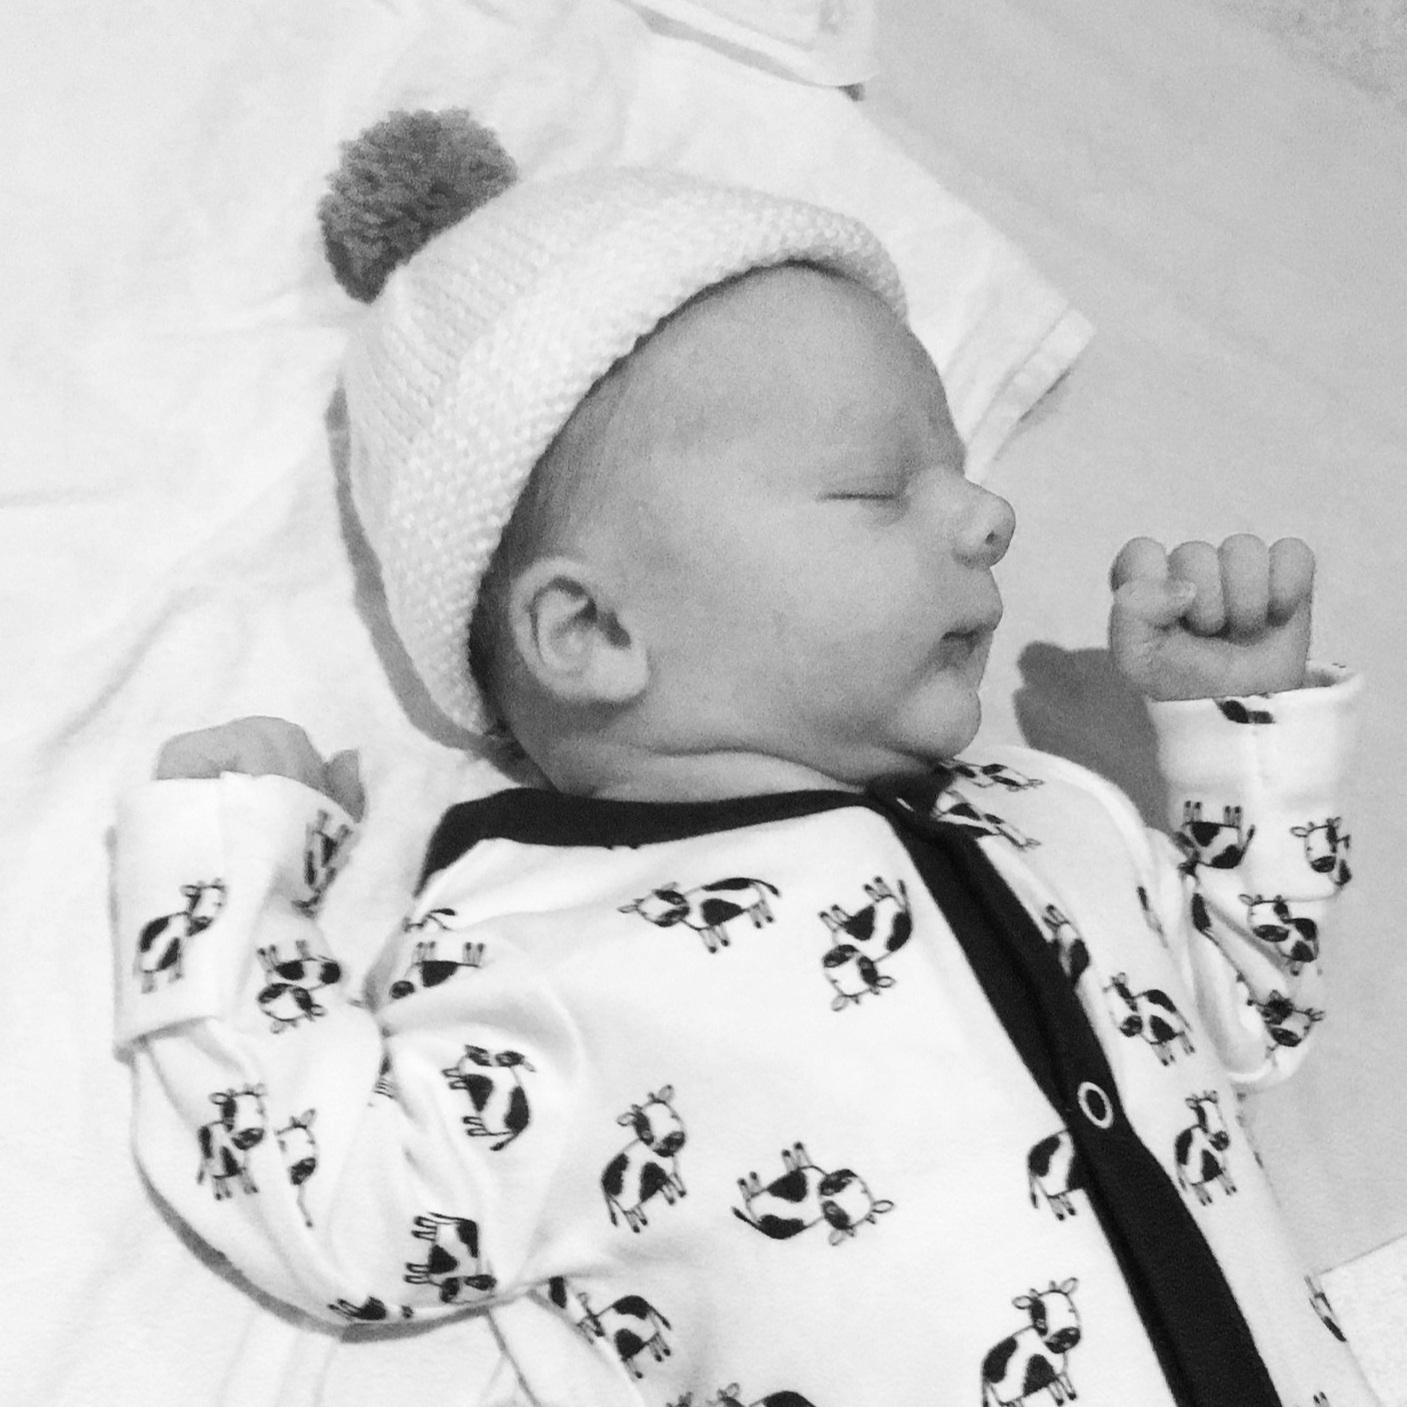 newborn baby Jerry.jpg